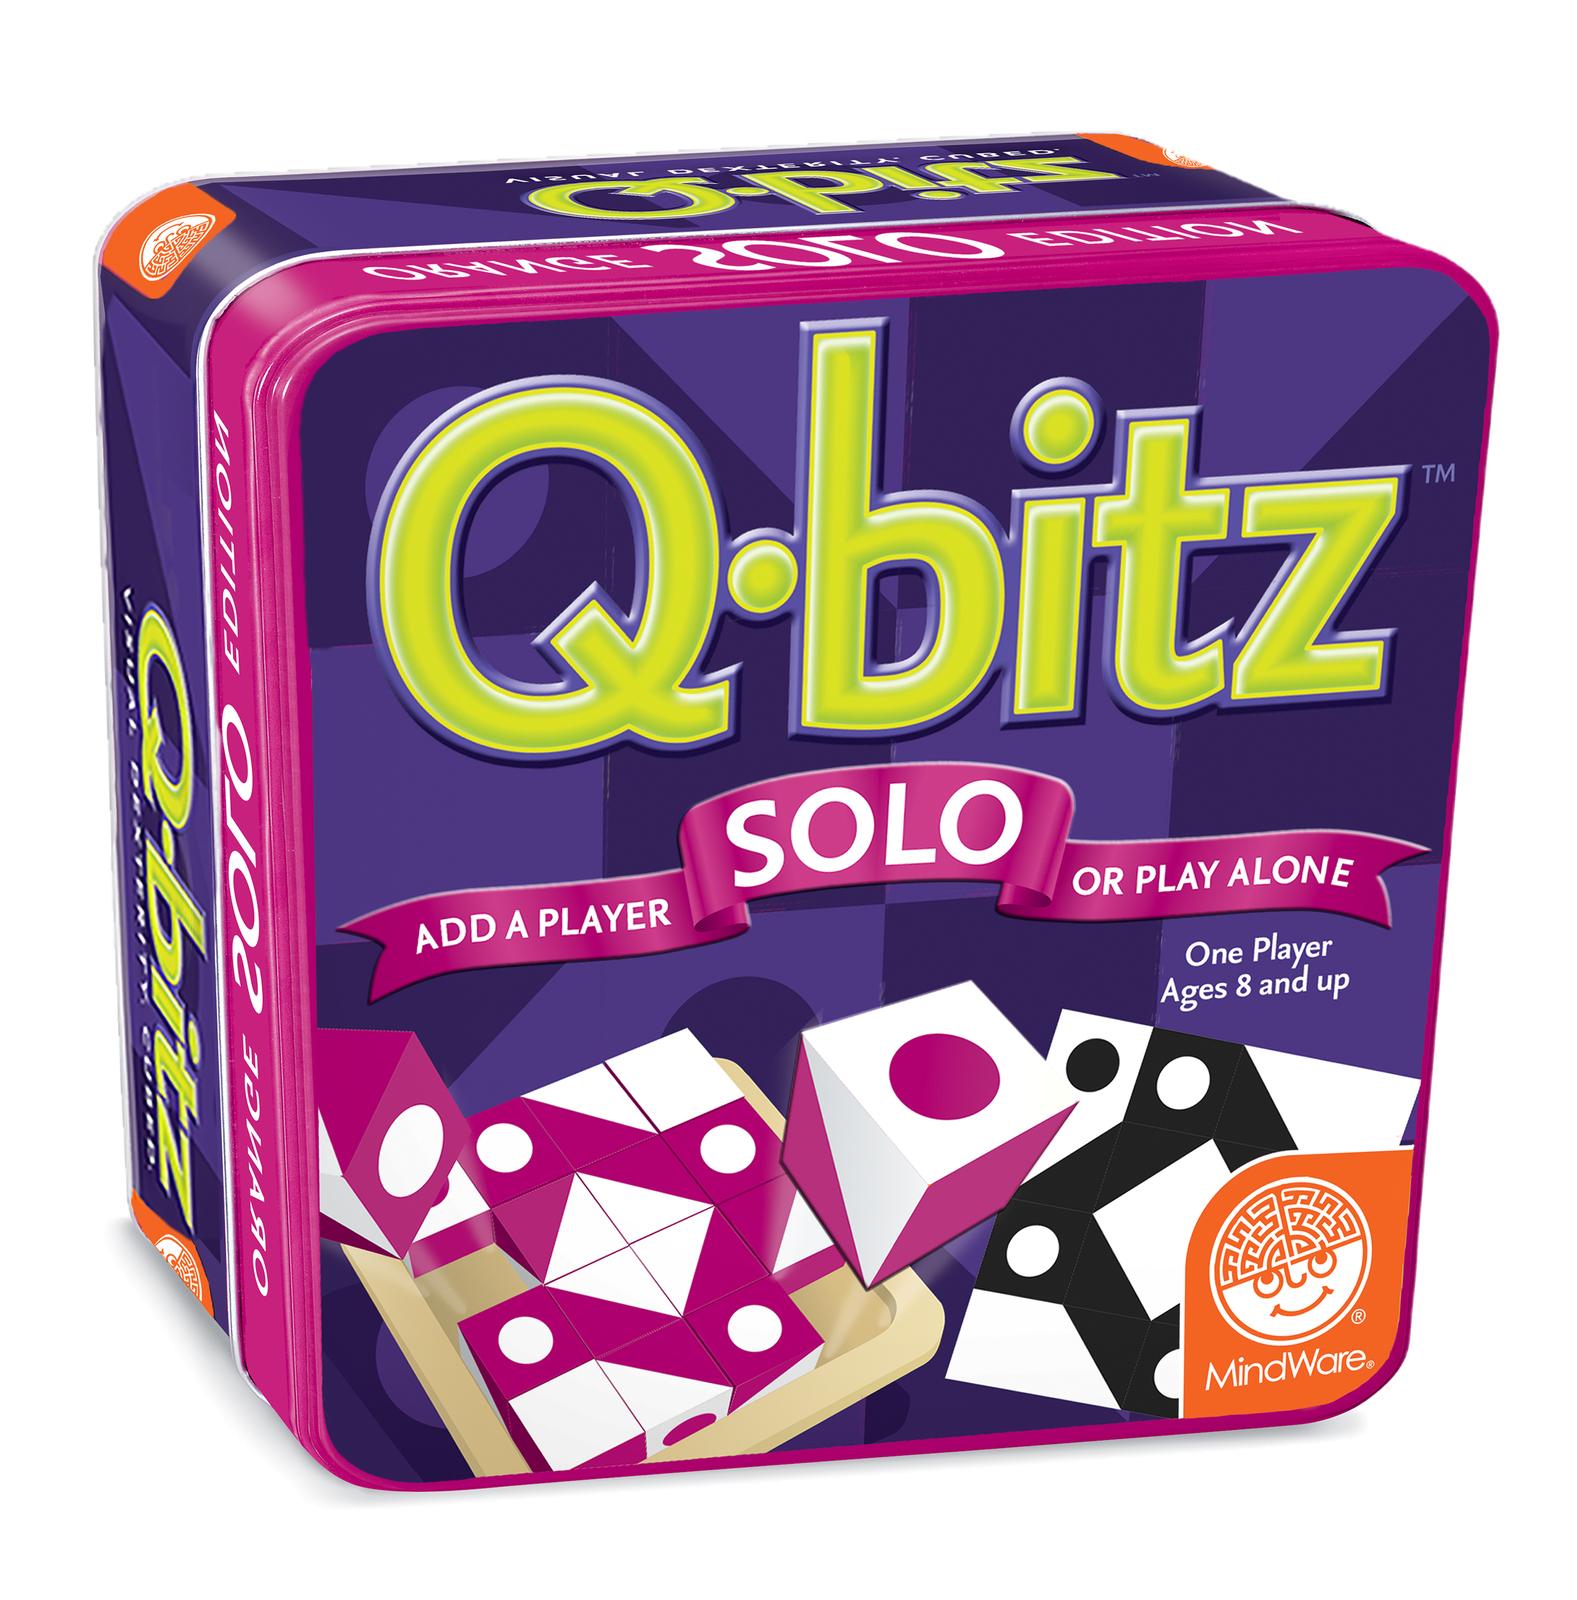 Mindware Games: Q-bitz Solo - Magenta Edition image